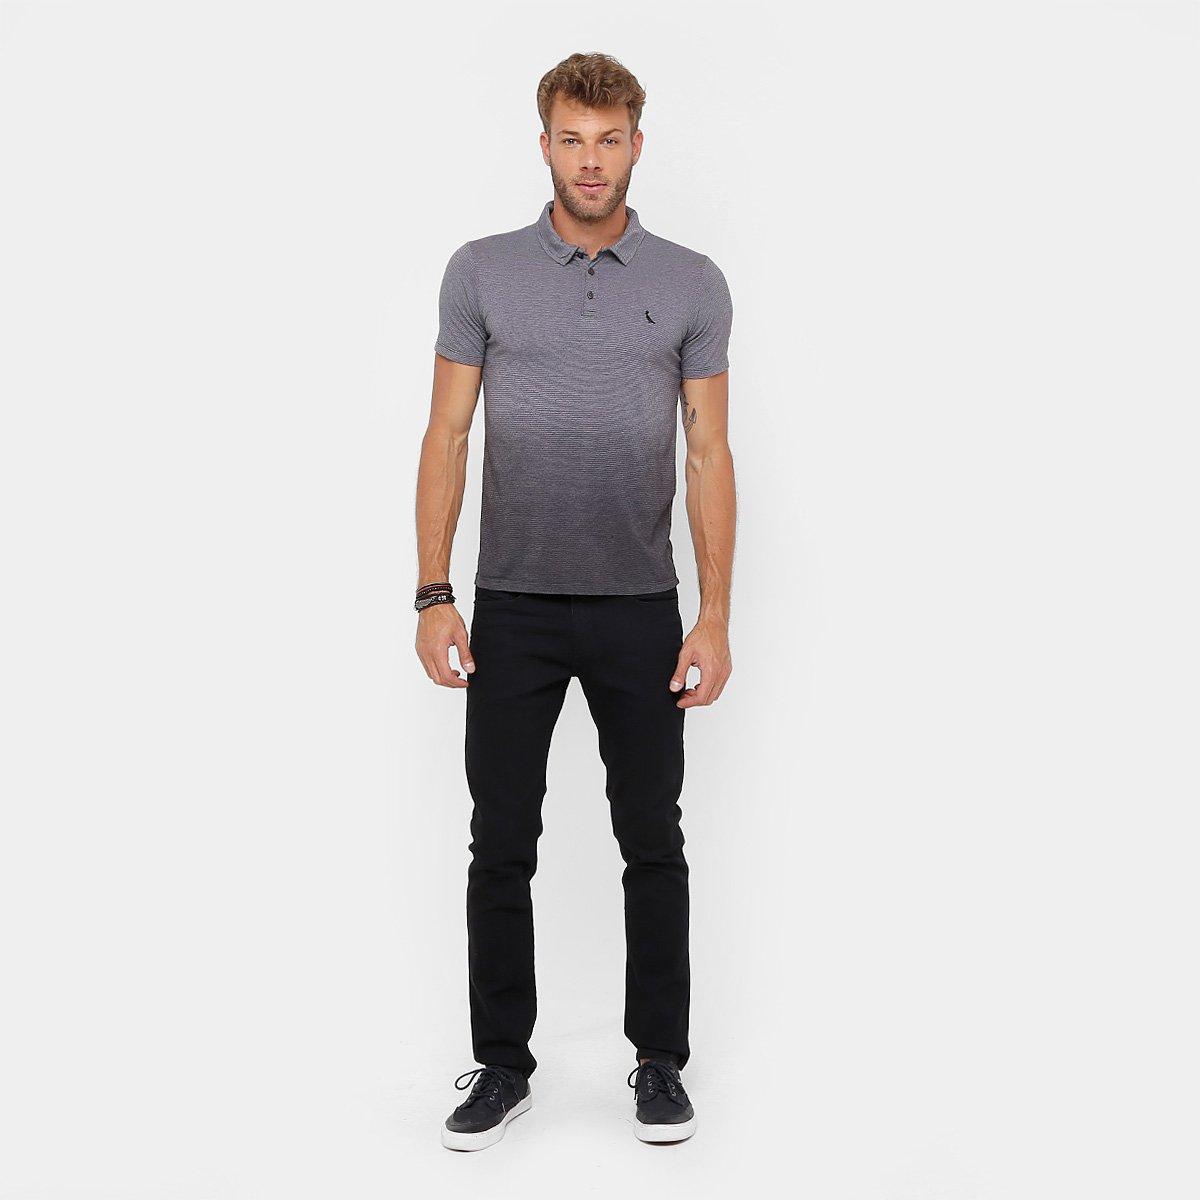 Camisa Polo Reserva Malha Degradê Masculina - Compre Agora  697e182ed8805